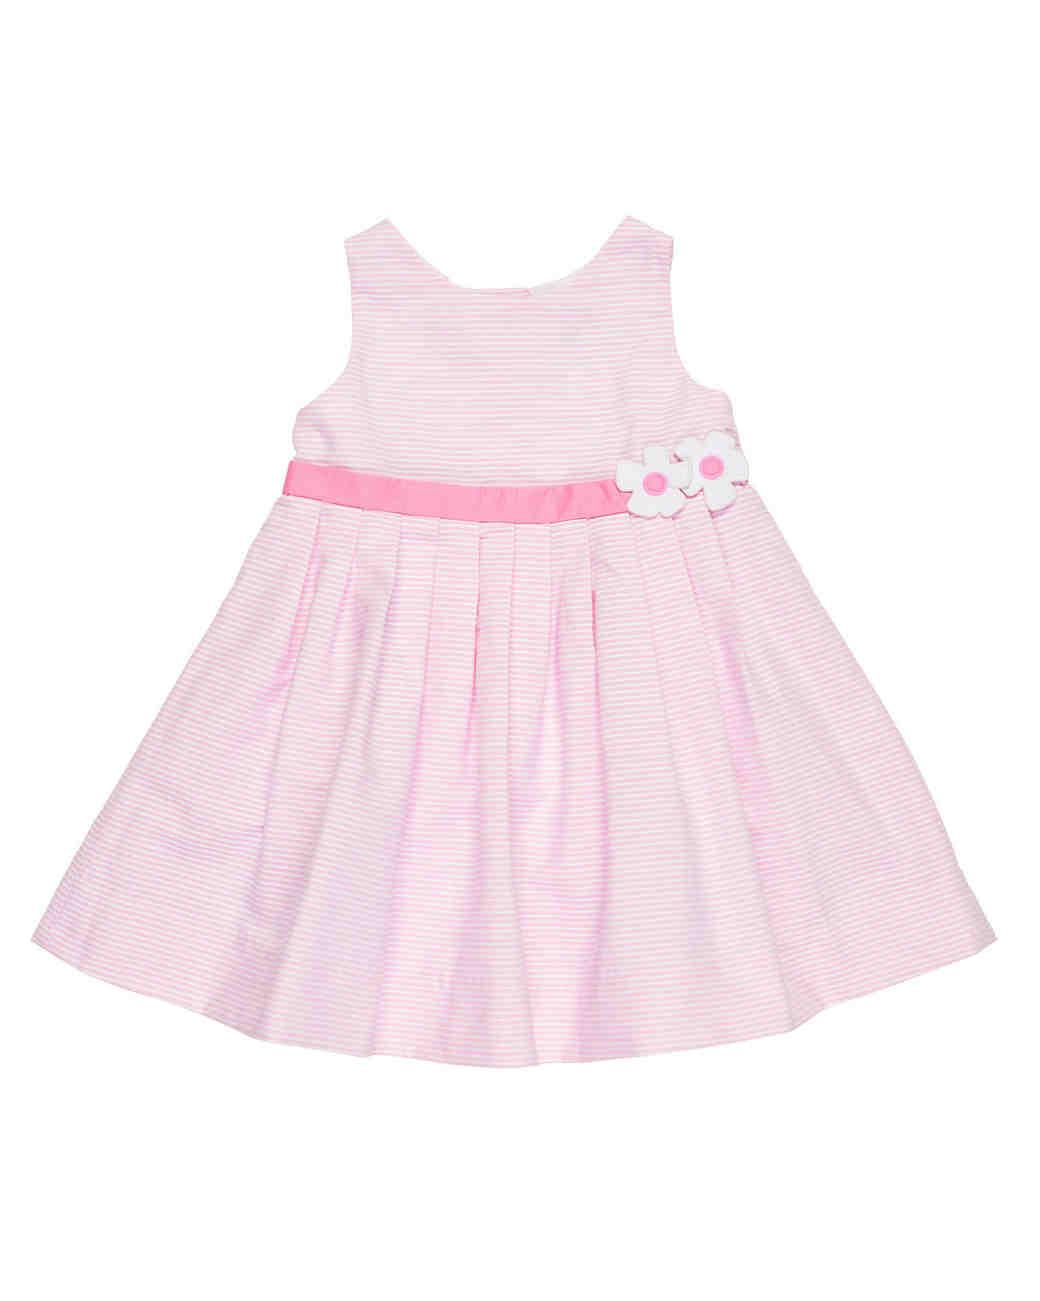 spring flower girl dresses pink florence eiseman